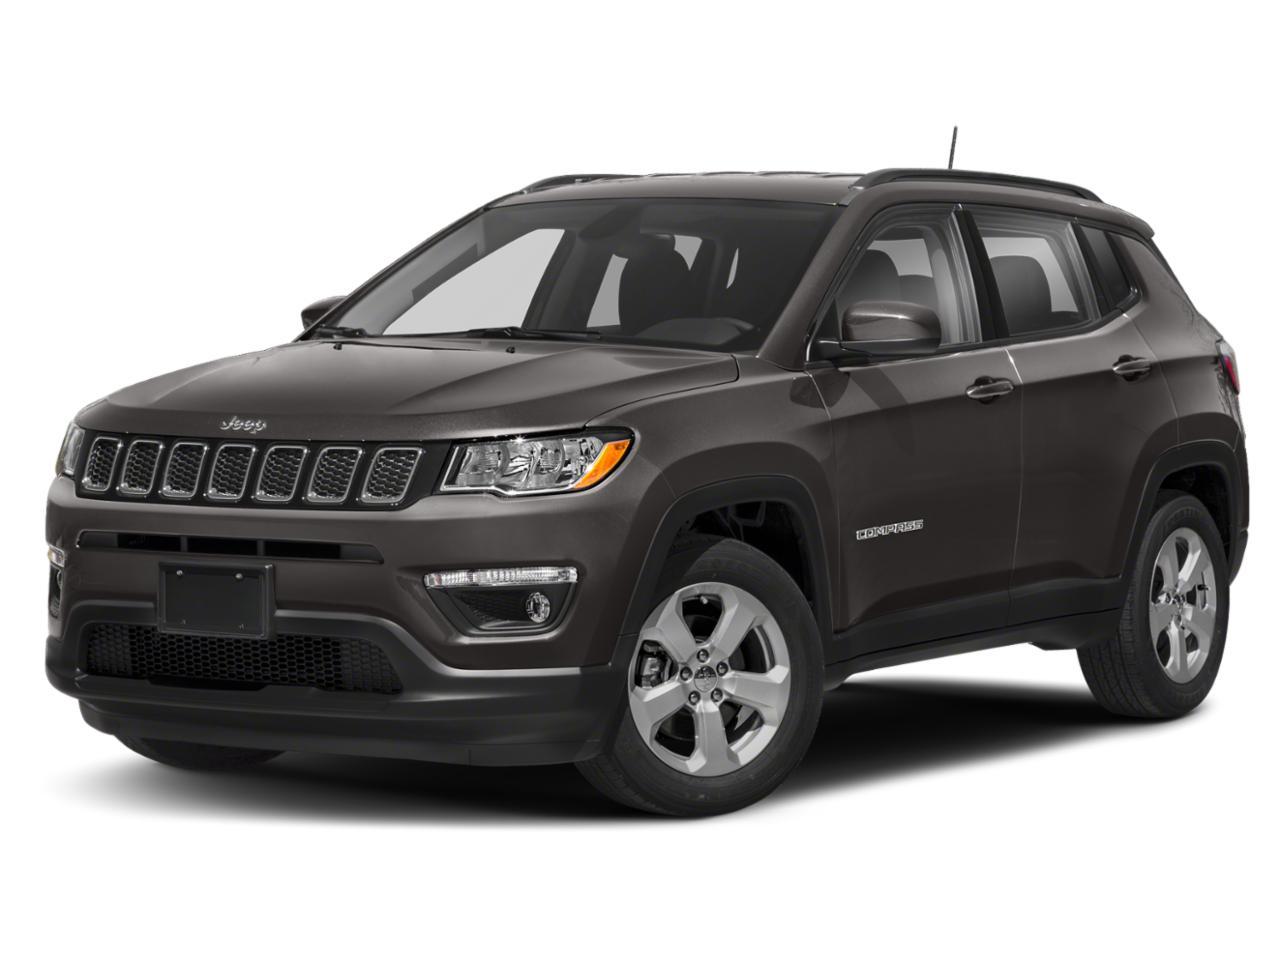 2018 Jeep Compass Vehicle Photo in Atlantic City, NJ 08401